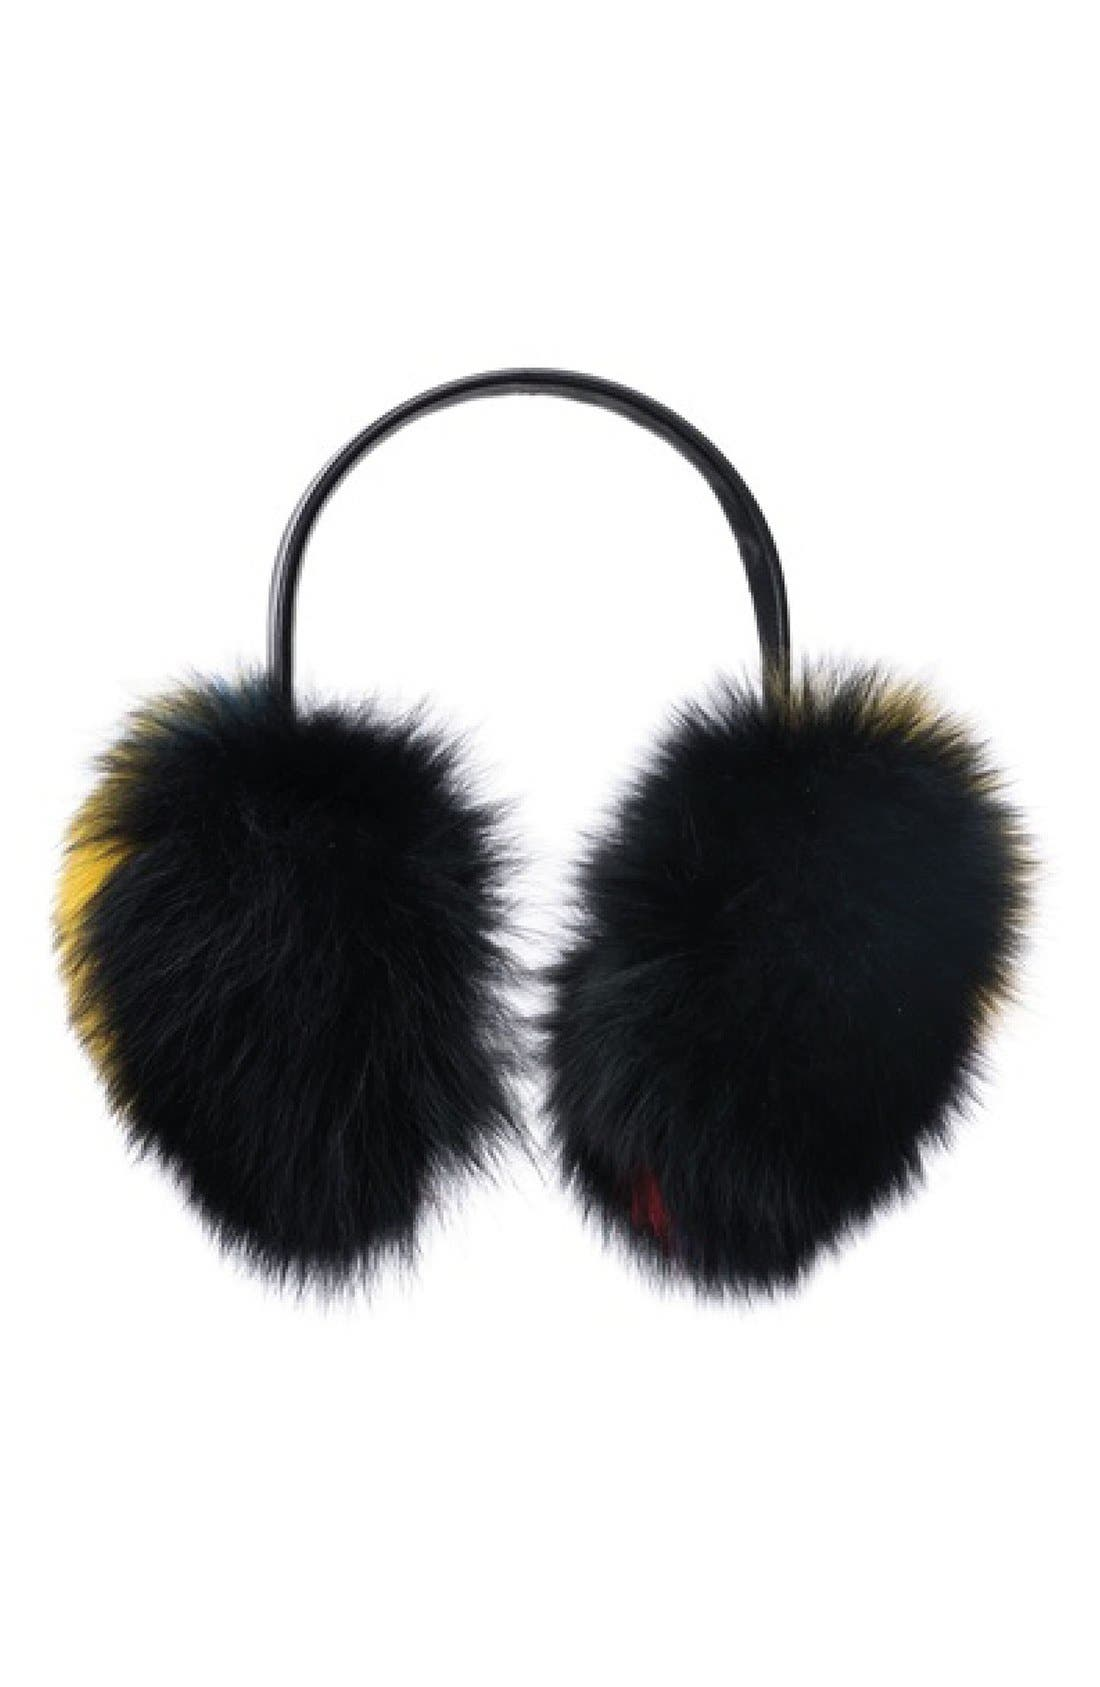 Alternate Image 1 Selected - Eugenia Kim 'Janine' Genuine Fox Fur Earmuffs